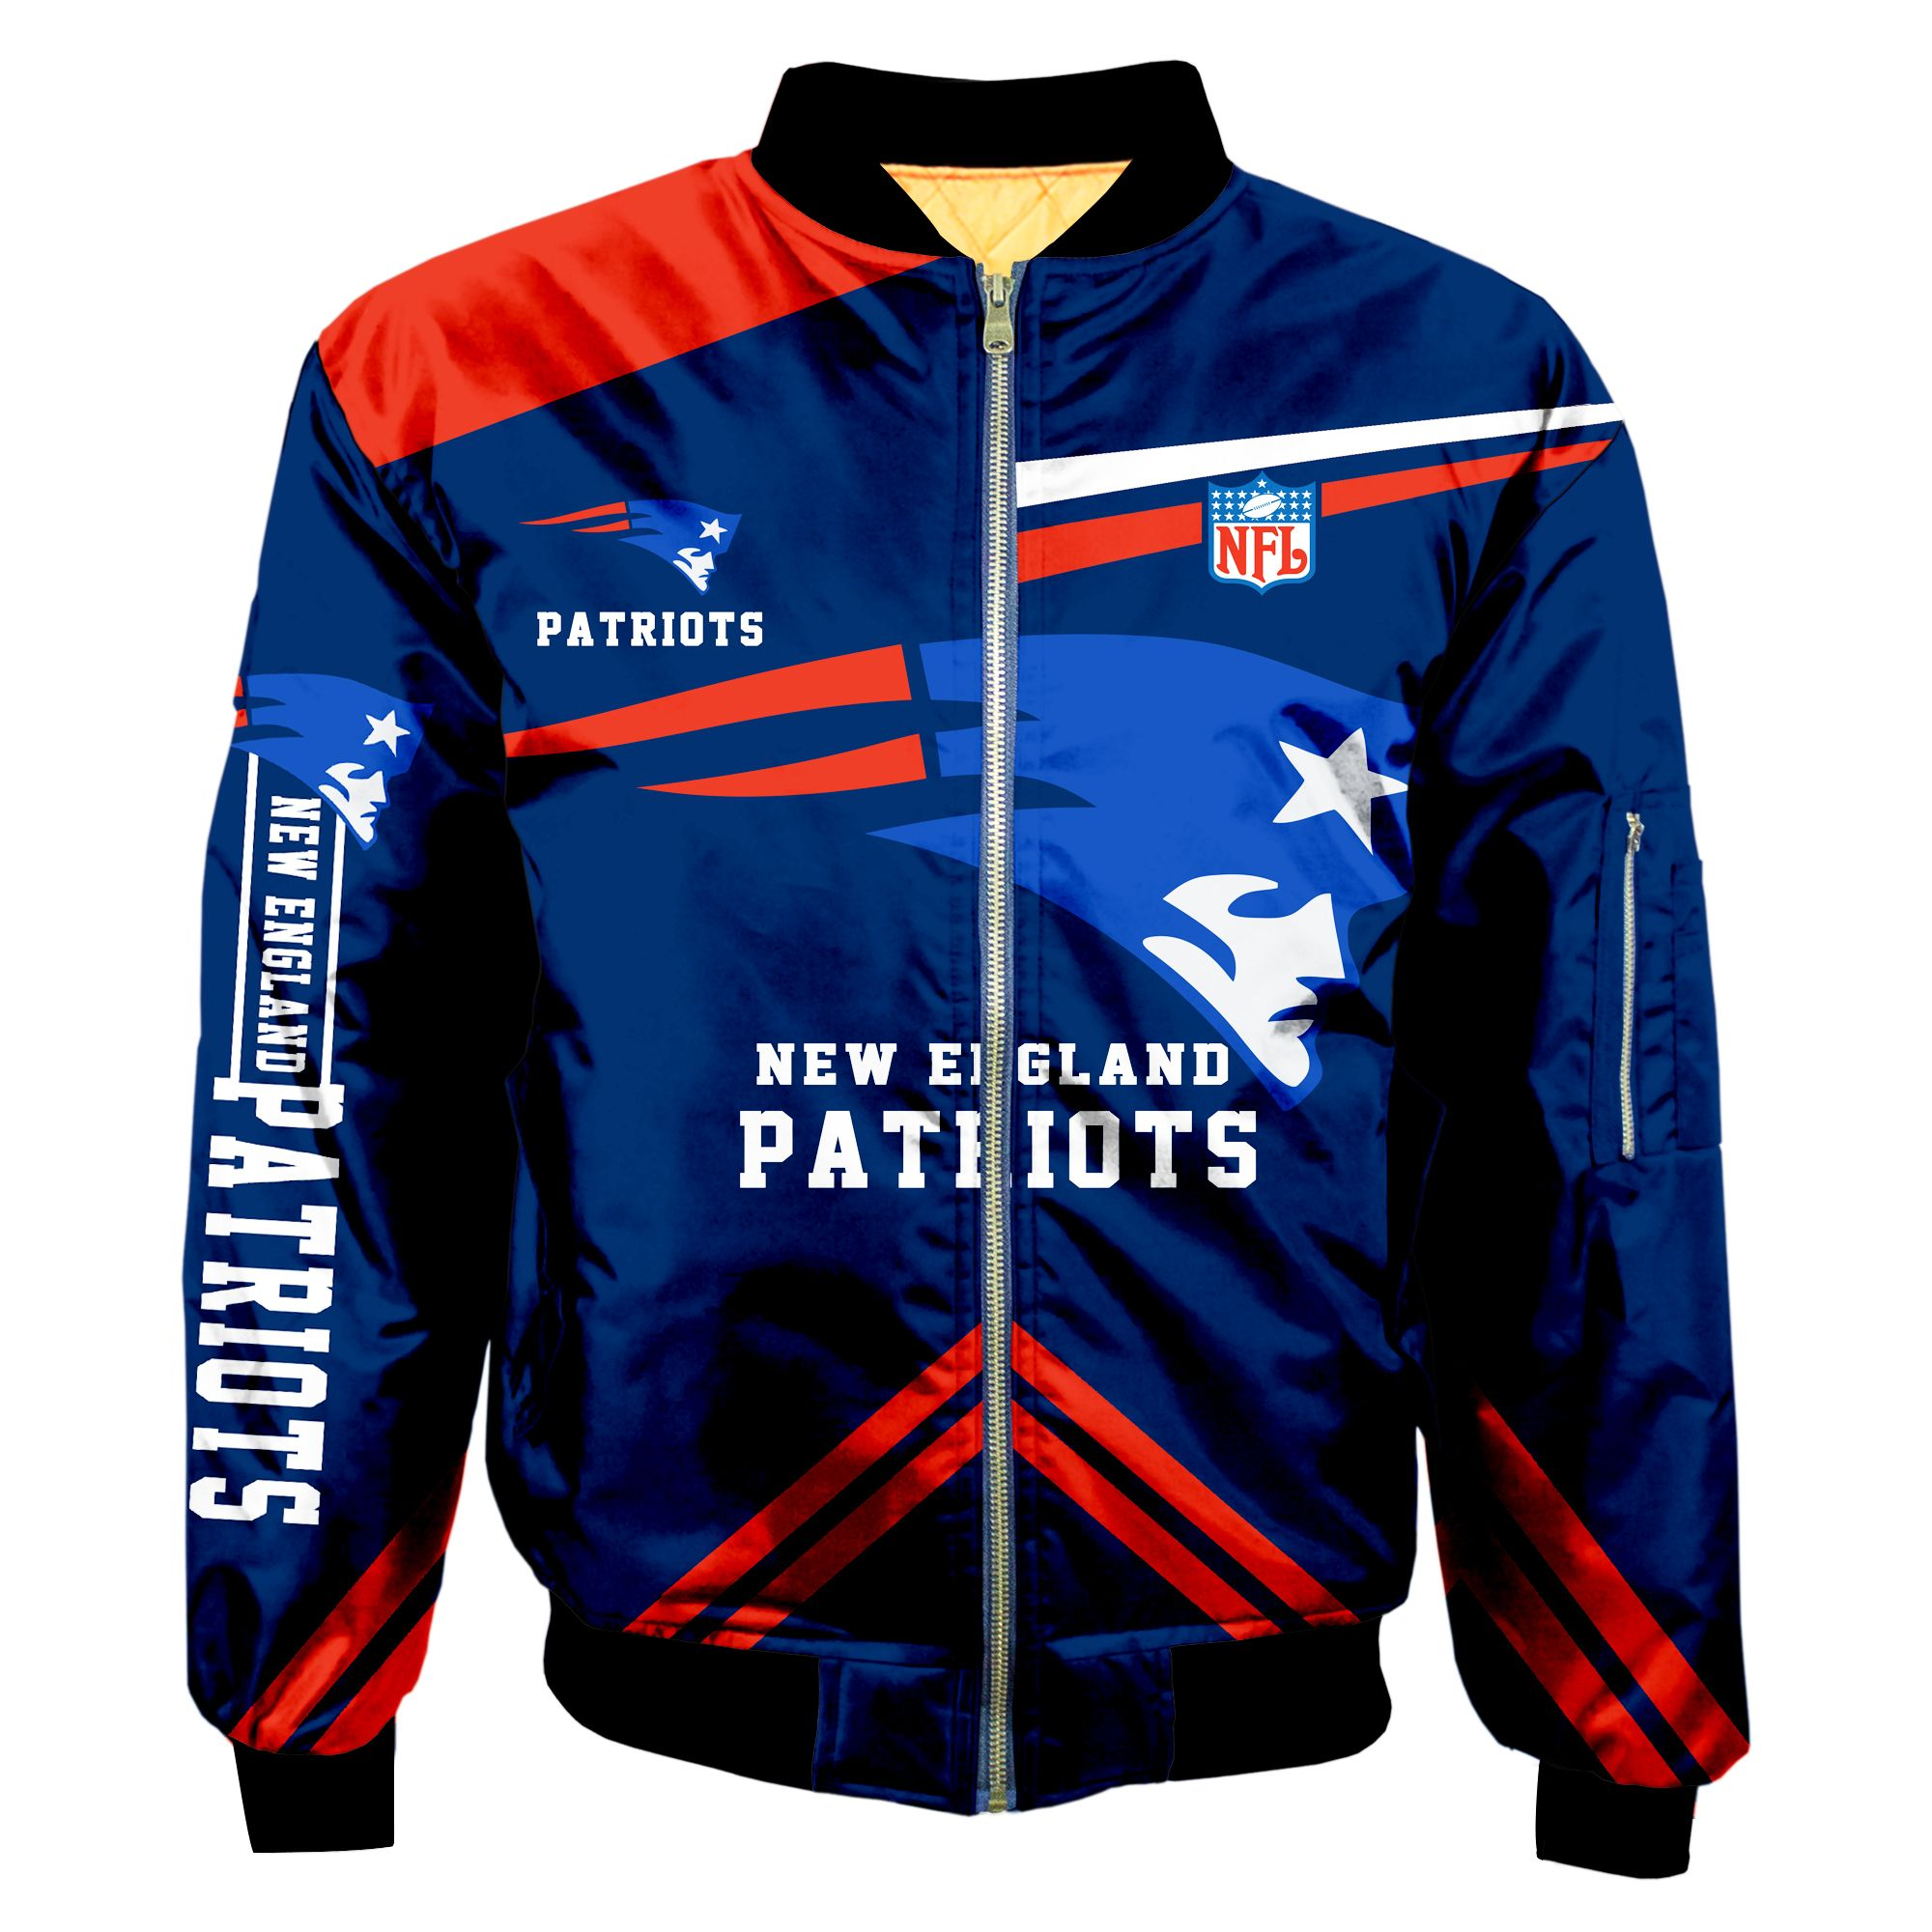 New England Patriots Bomber Jacket Men Women CottonPadded